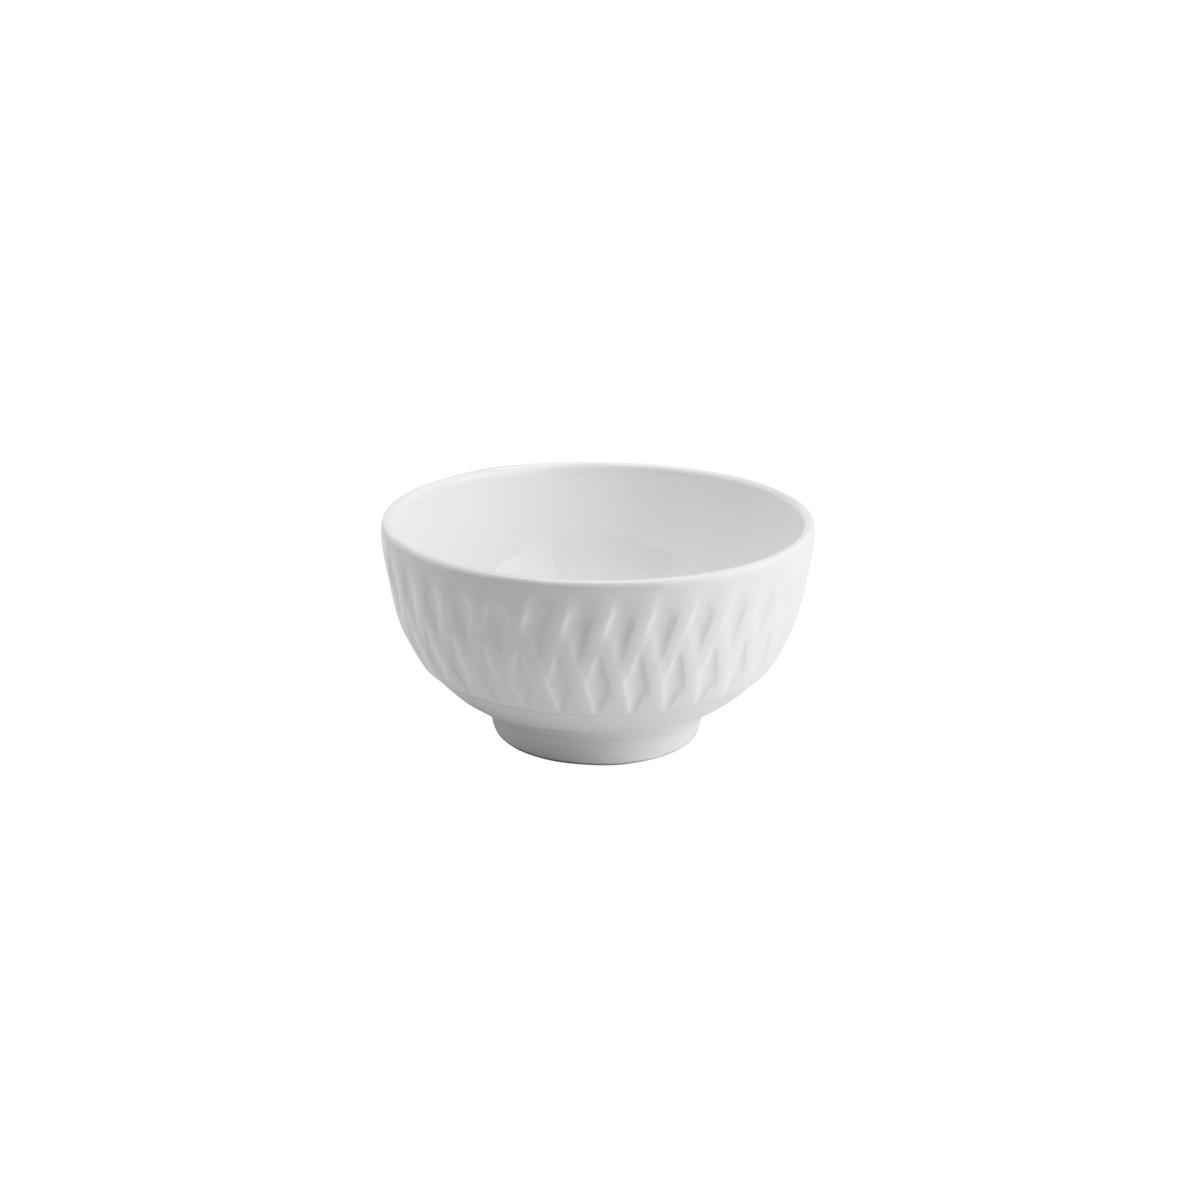 Tigela de Porcelana Redonda Atlantis 12cm - Lyor